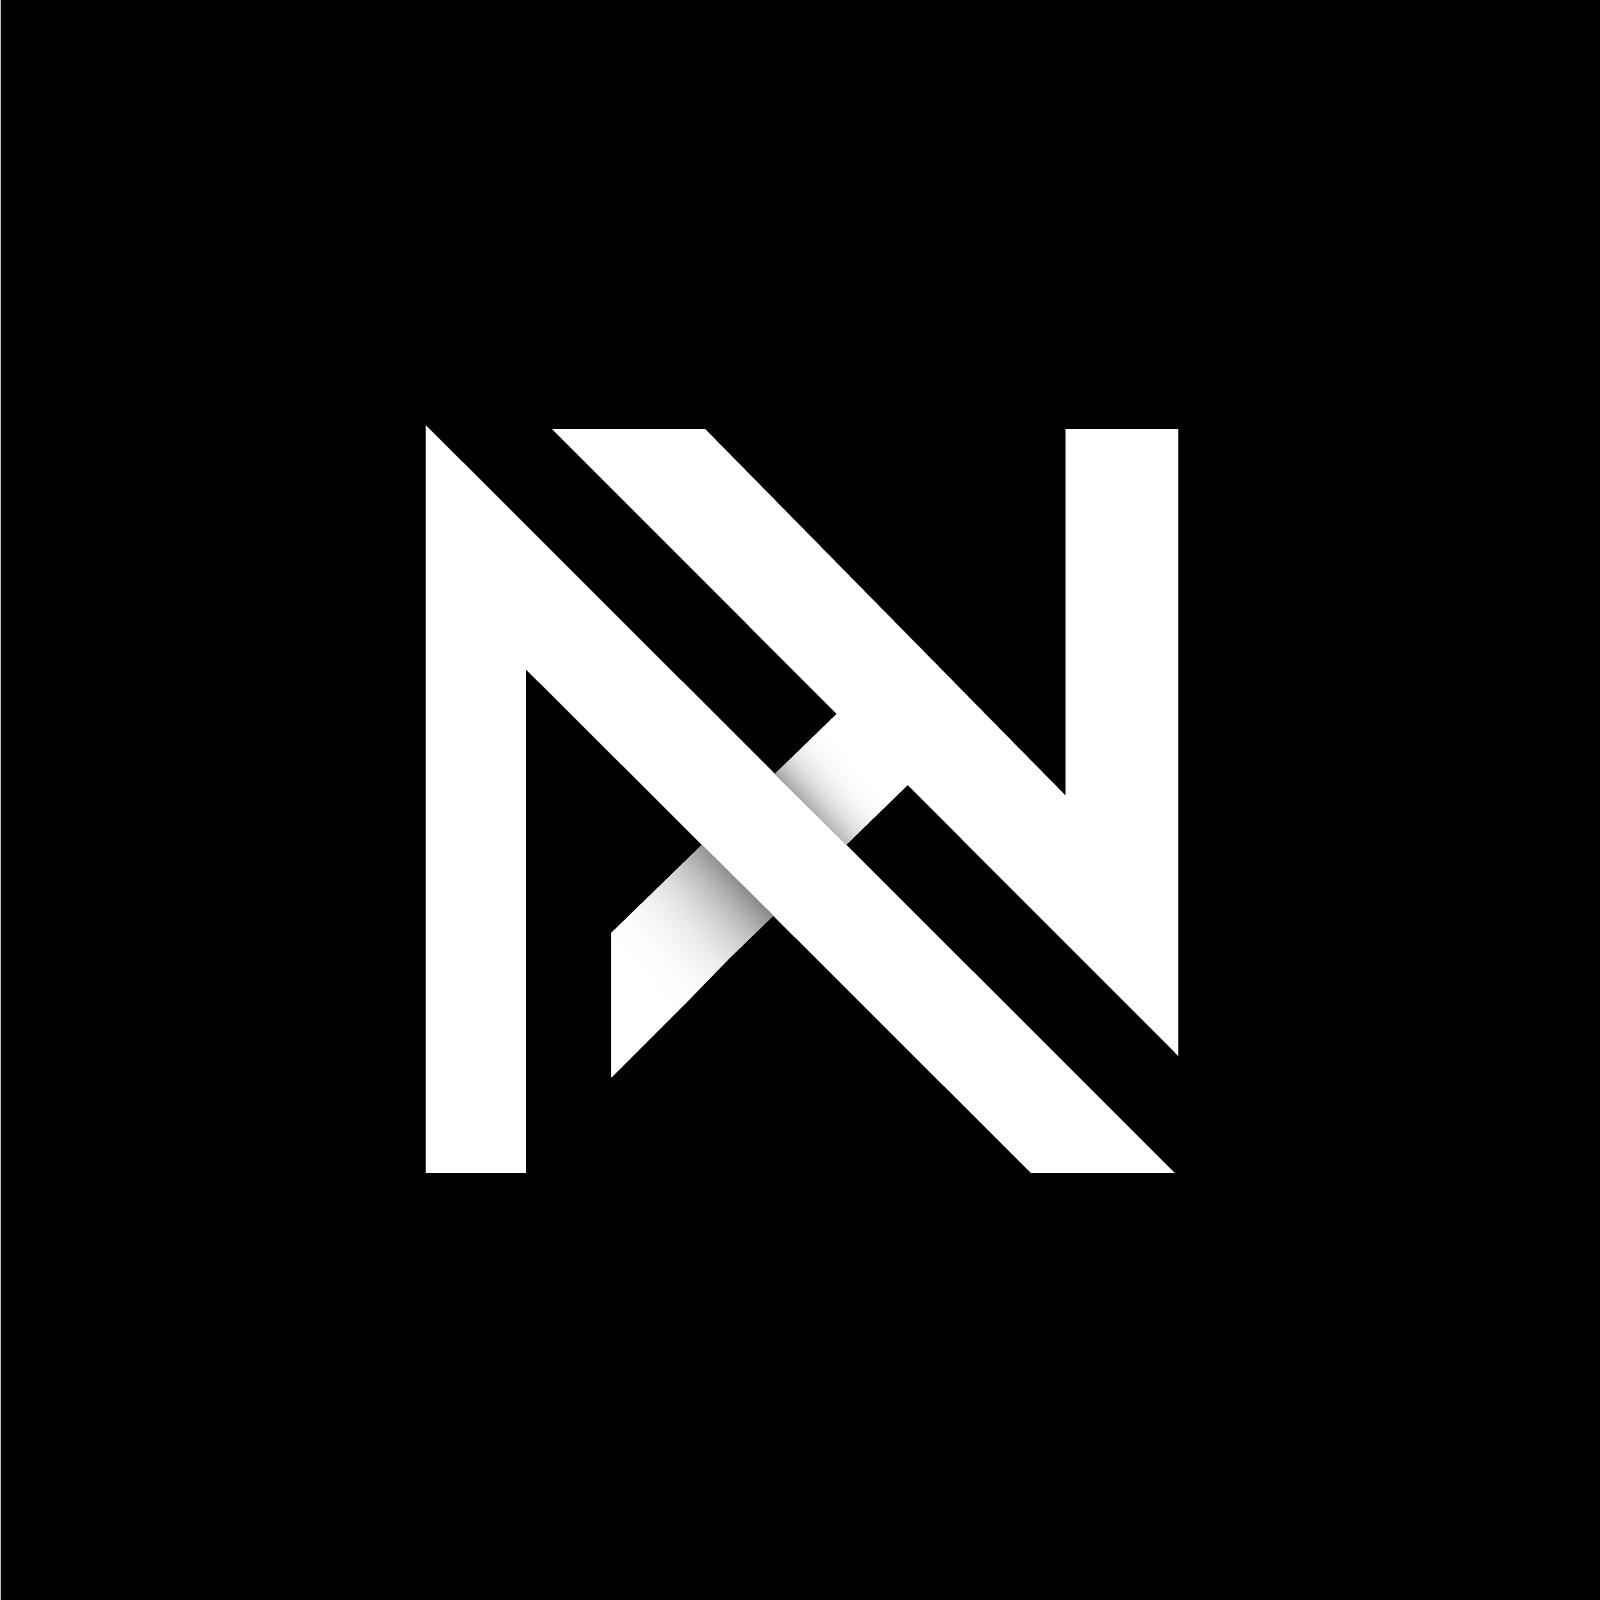 Logo fix 02